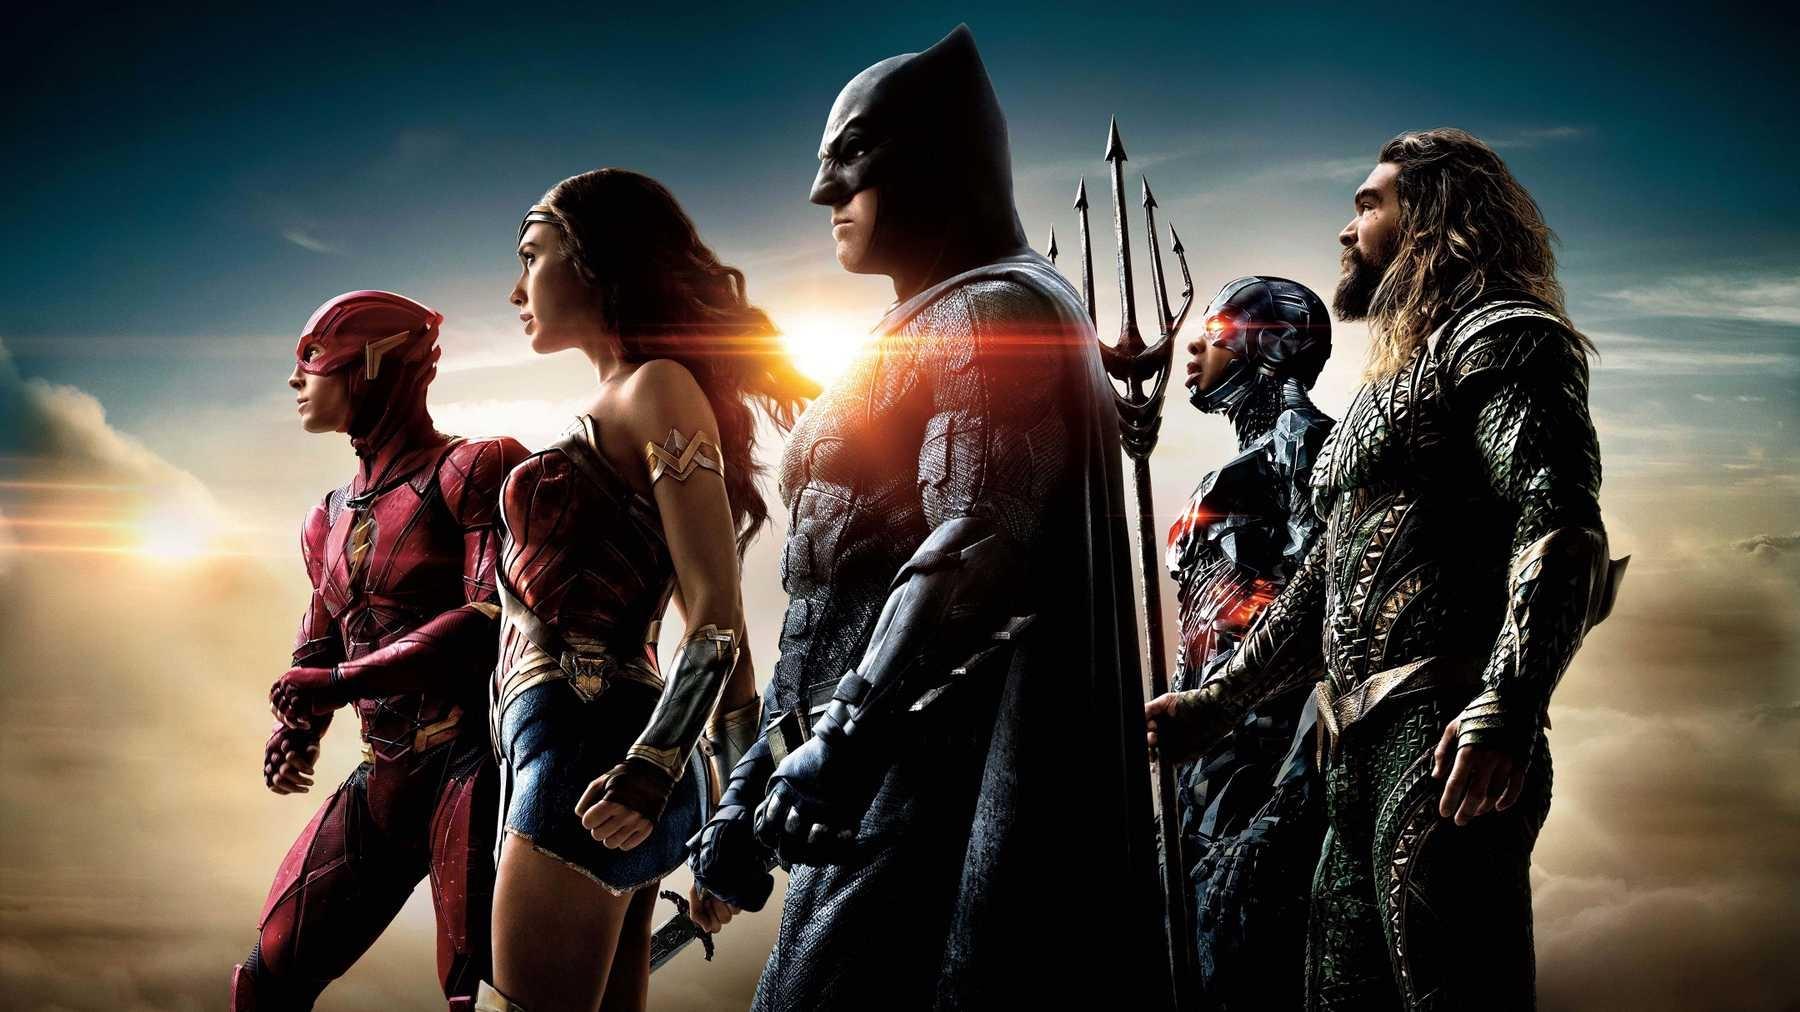 'Lien minh Cong ly' cua Joss Whedon la 'cuu tinh' cho DC anh 1